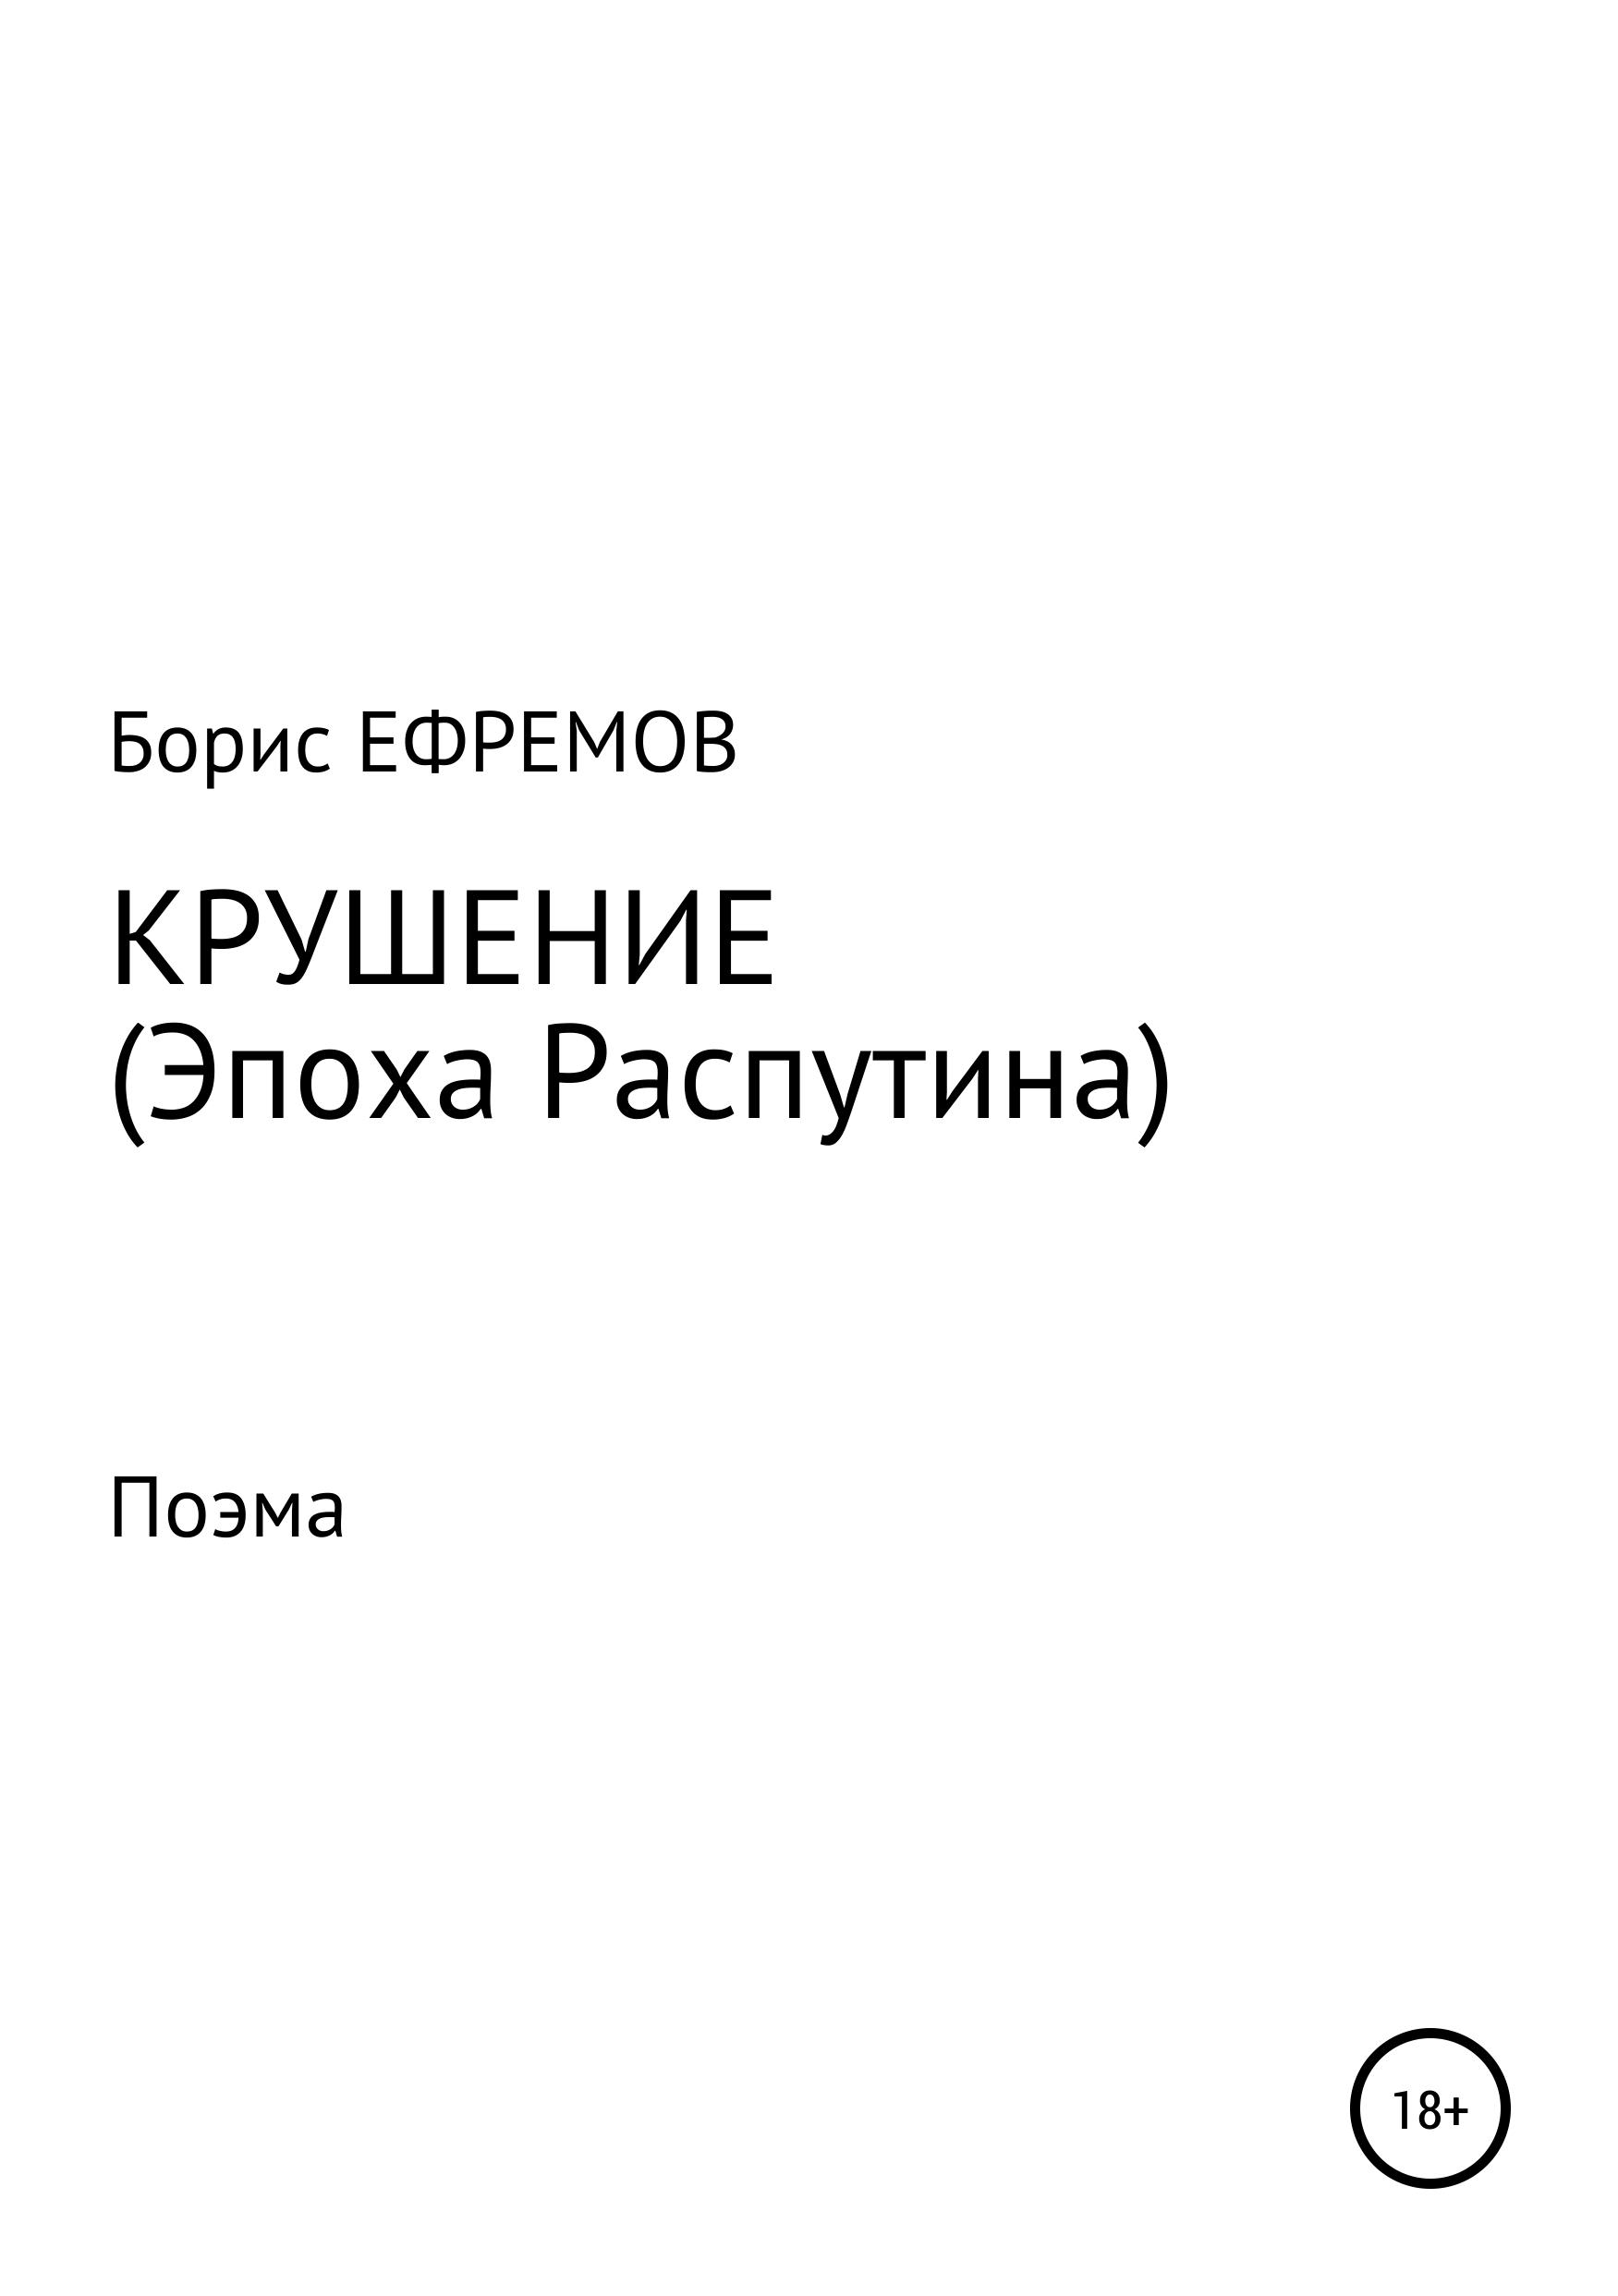 Крушение (Эпоха Распутина). Поэма